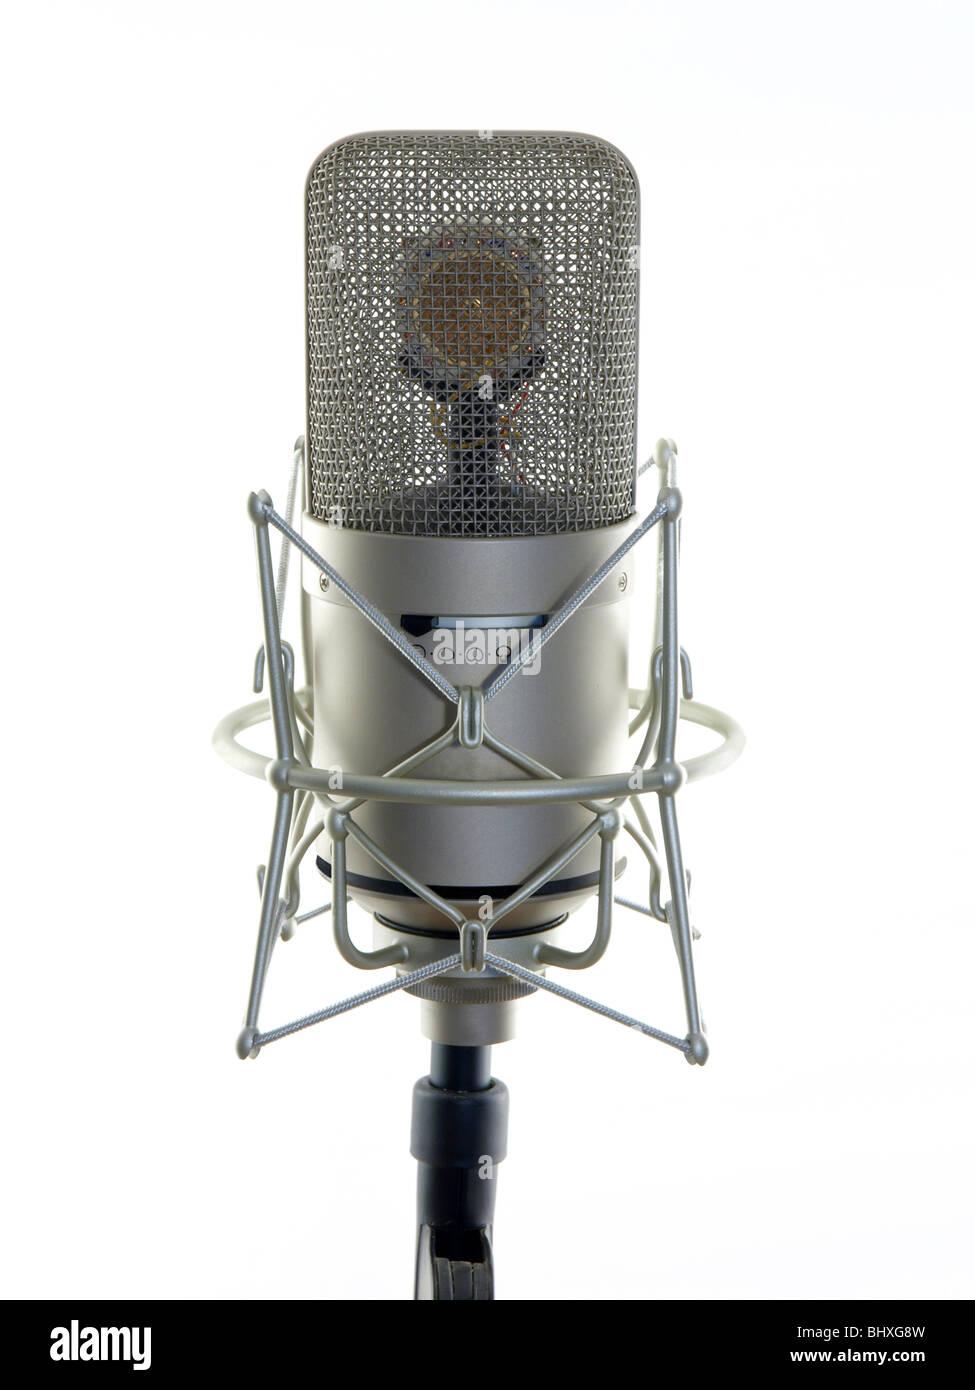 Très cher microphone de studio audio pro. Photo Stock